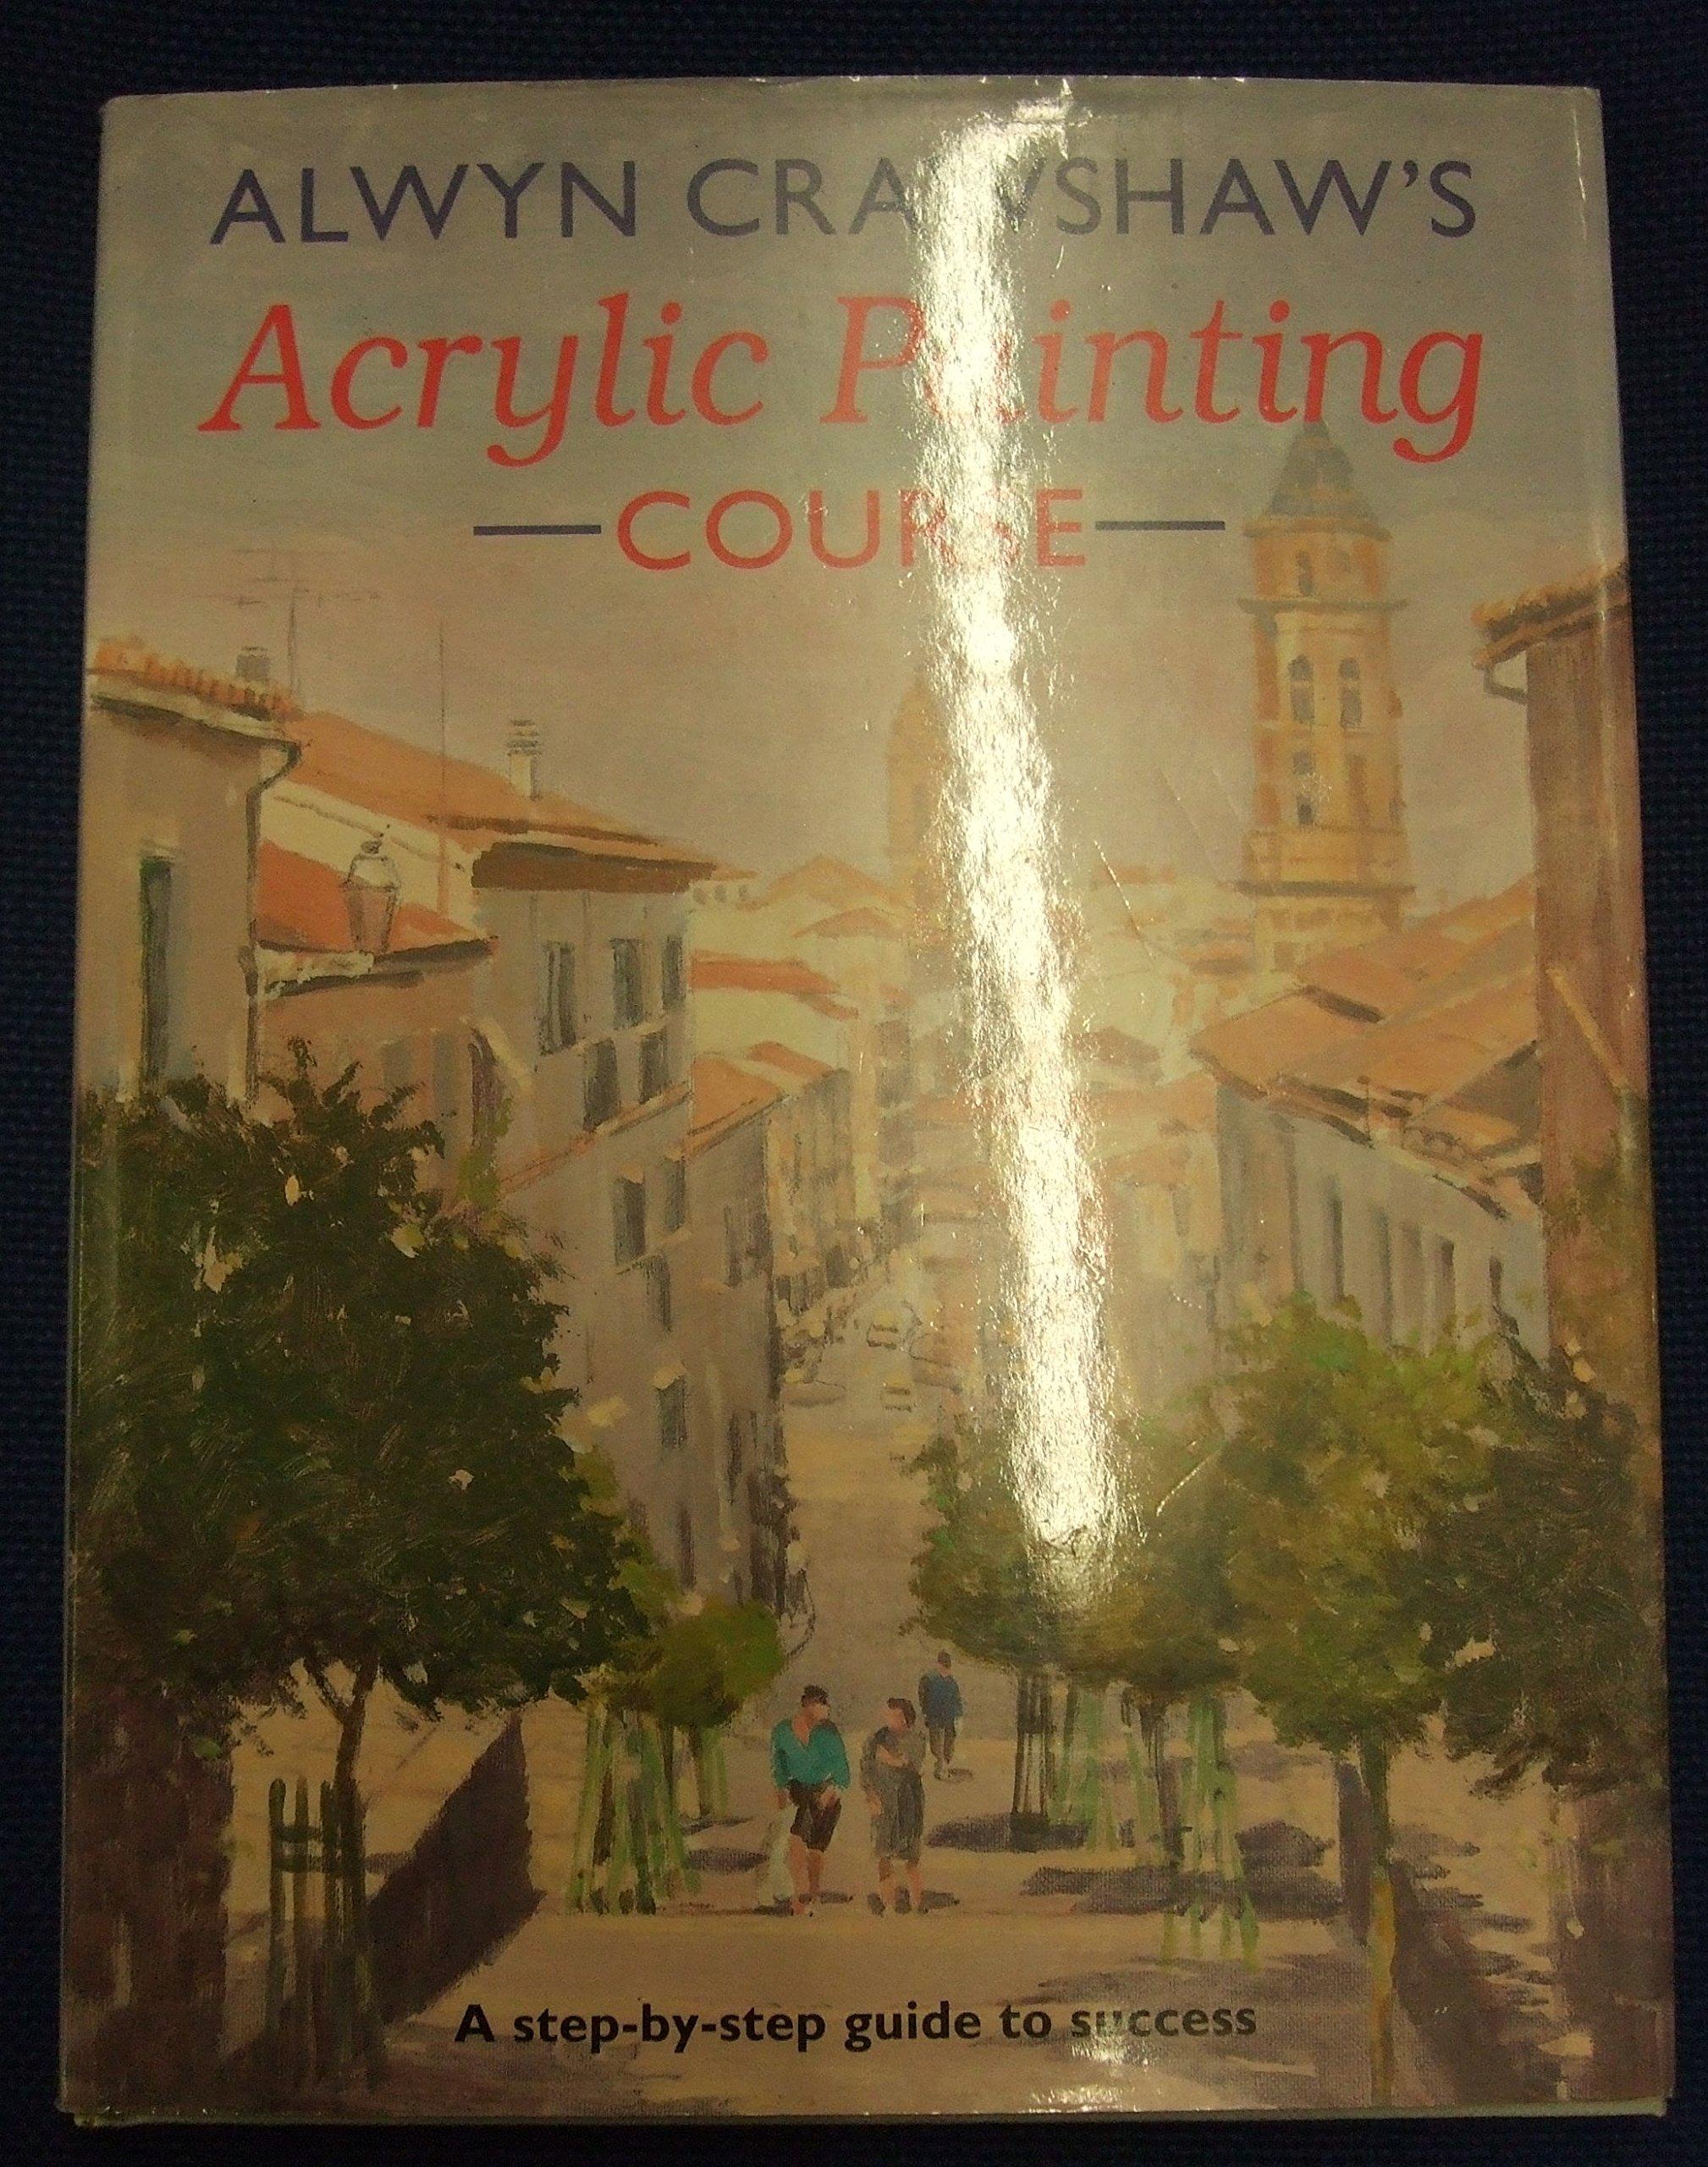 Alwyn Crawshaw's Acrylic Painting Course